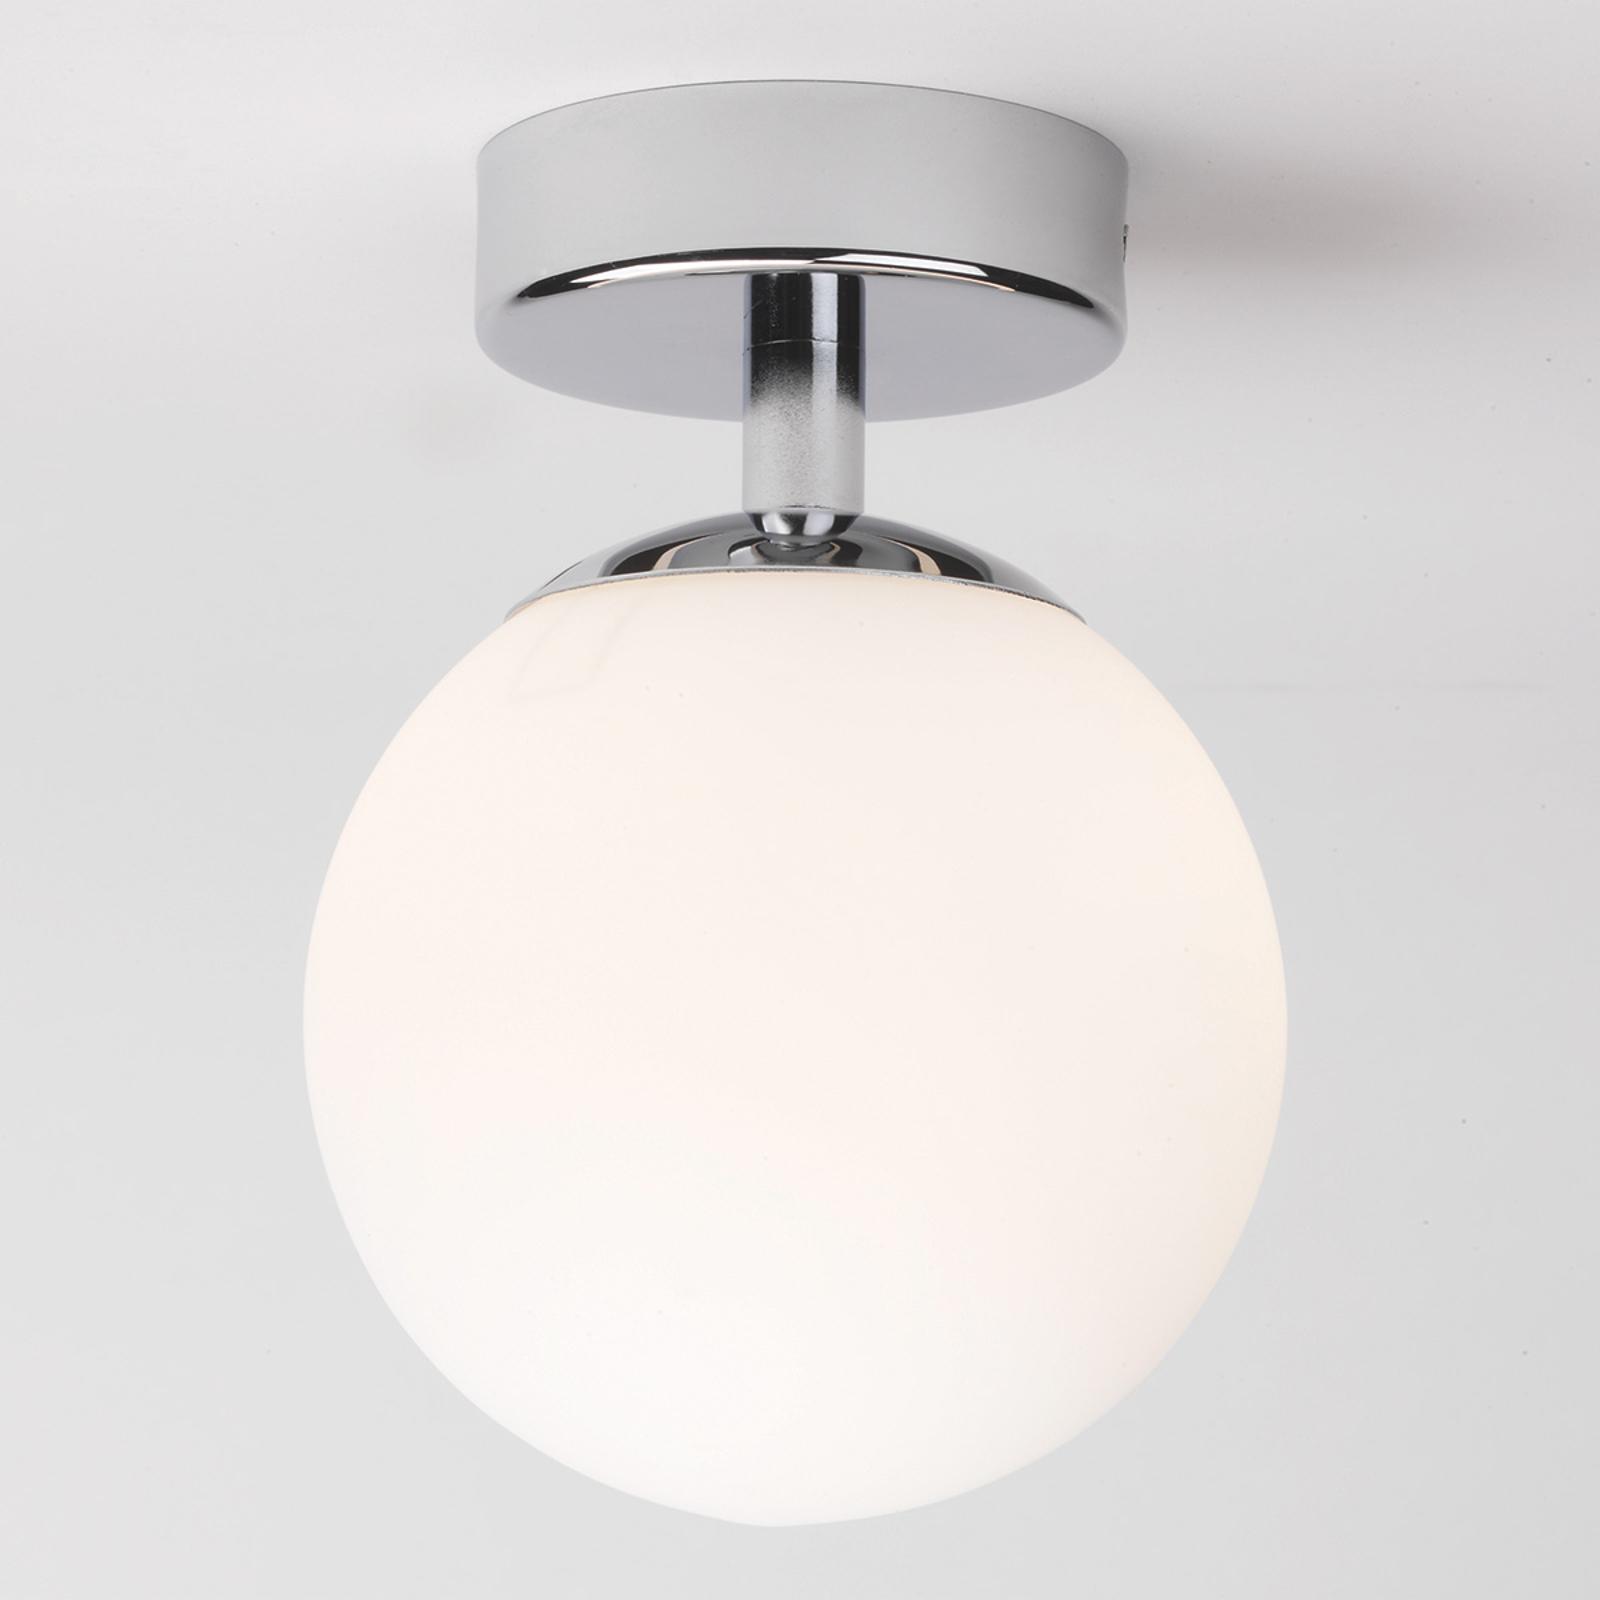 Decoratieve bolvormige plafondlamp DENVER